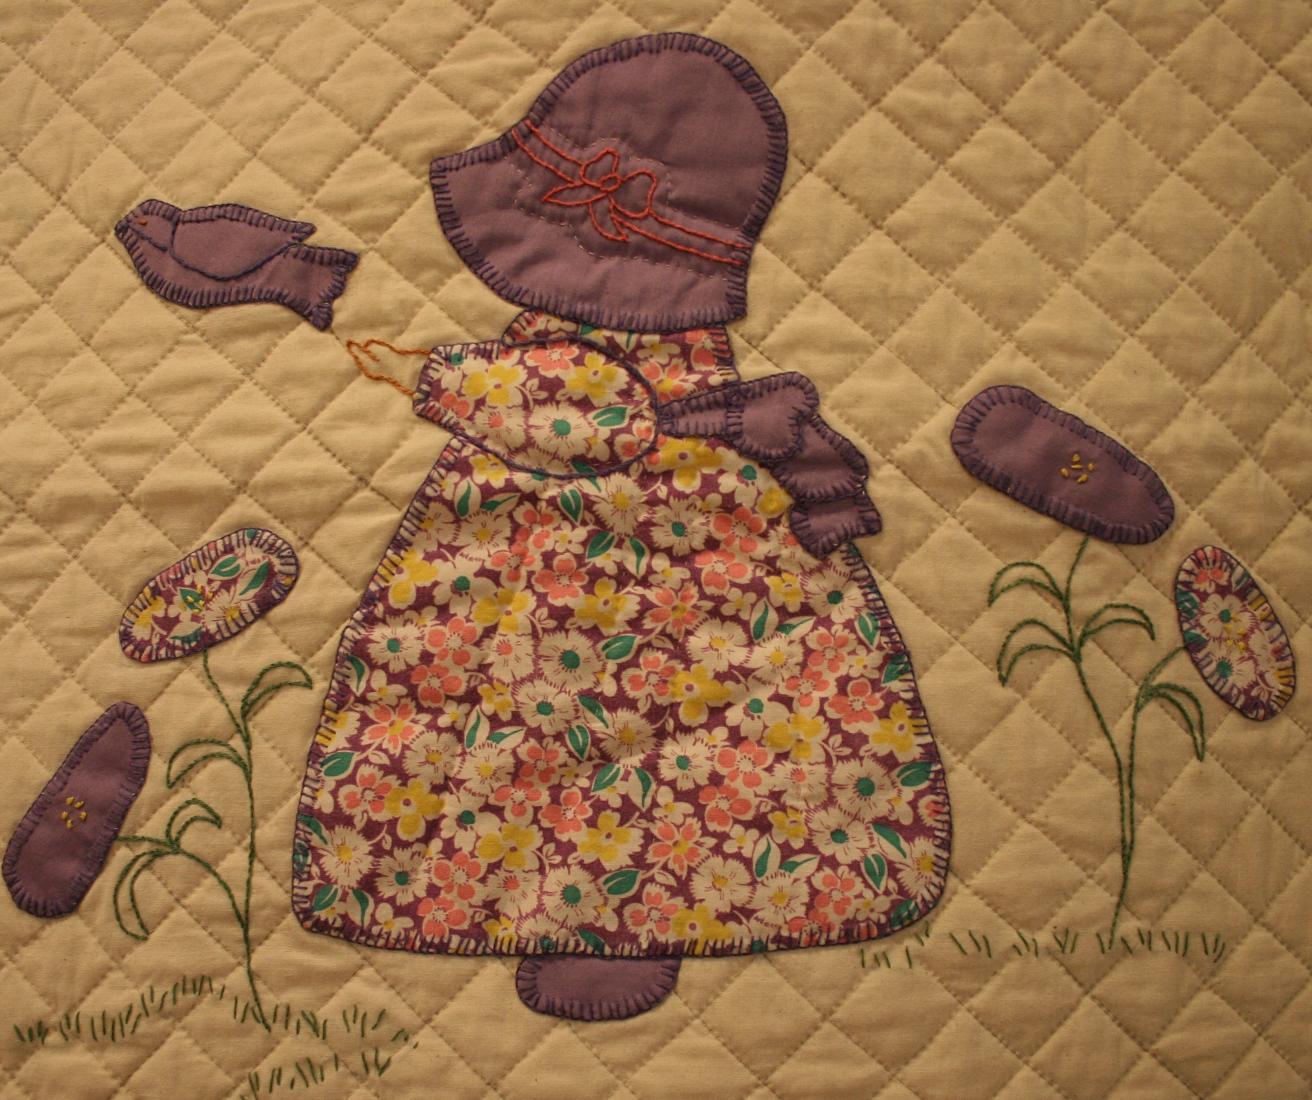 quilting   Minnesota Prairie Roots : sunbonnet sue quilt club - Adamdwight.com